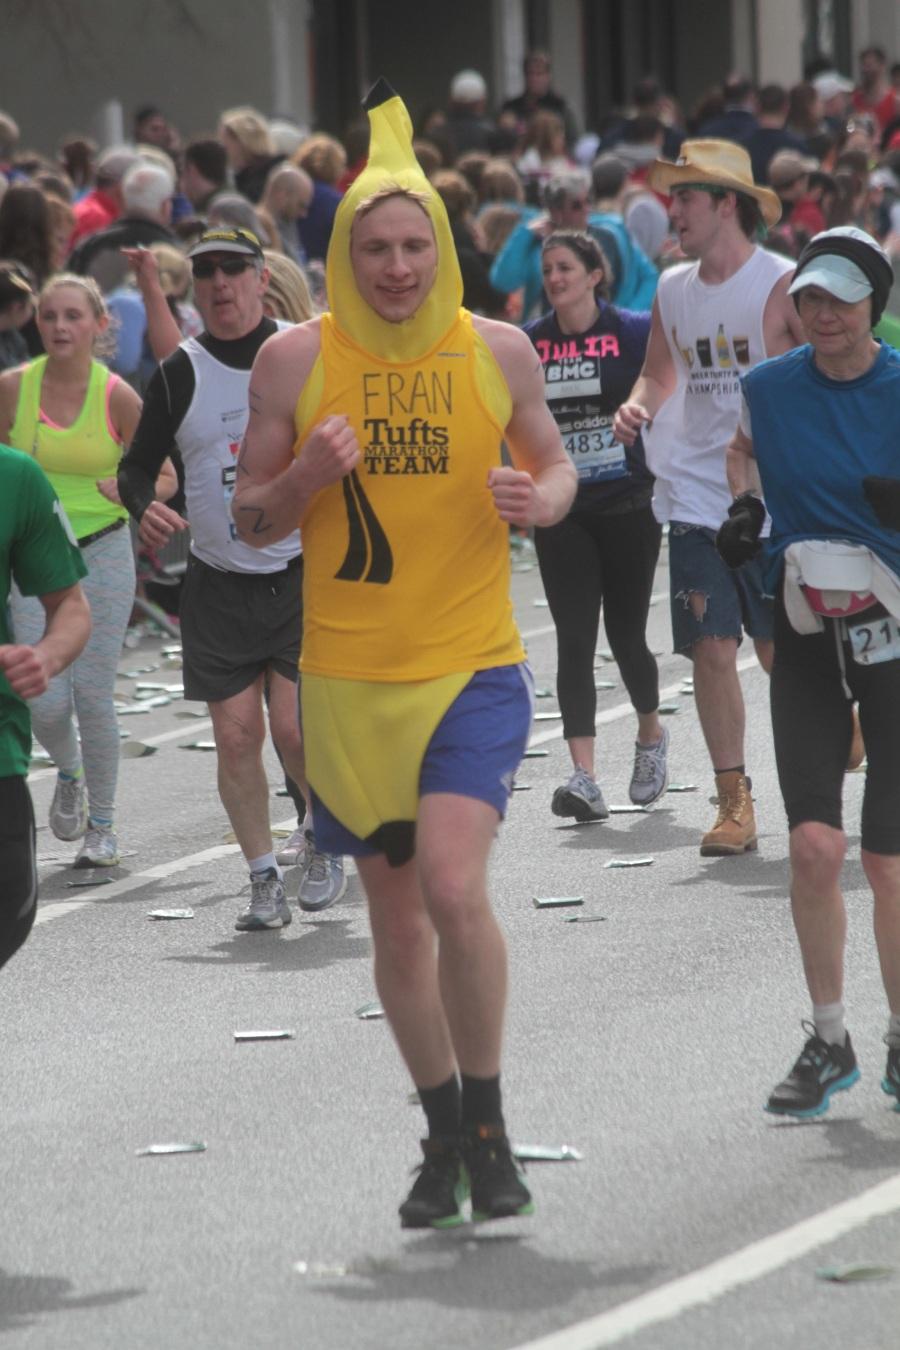 boston marathon 2013 banana man